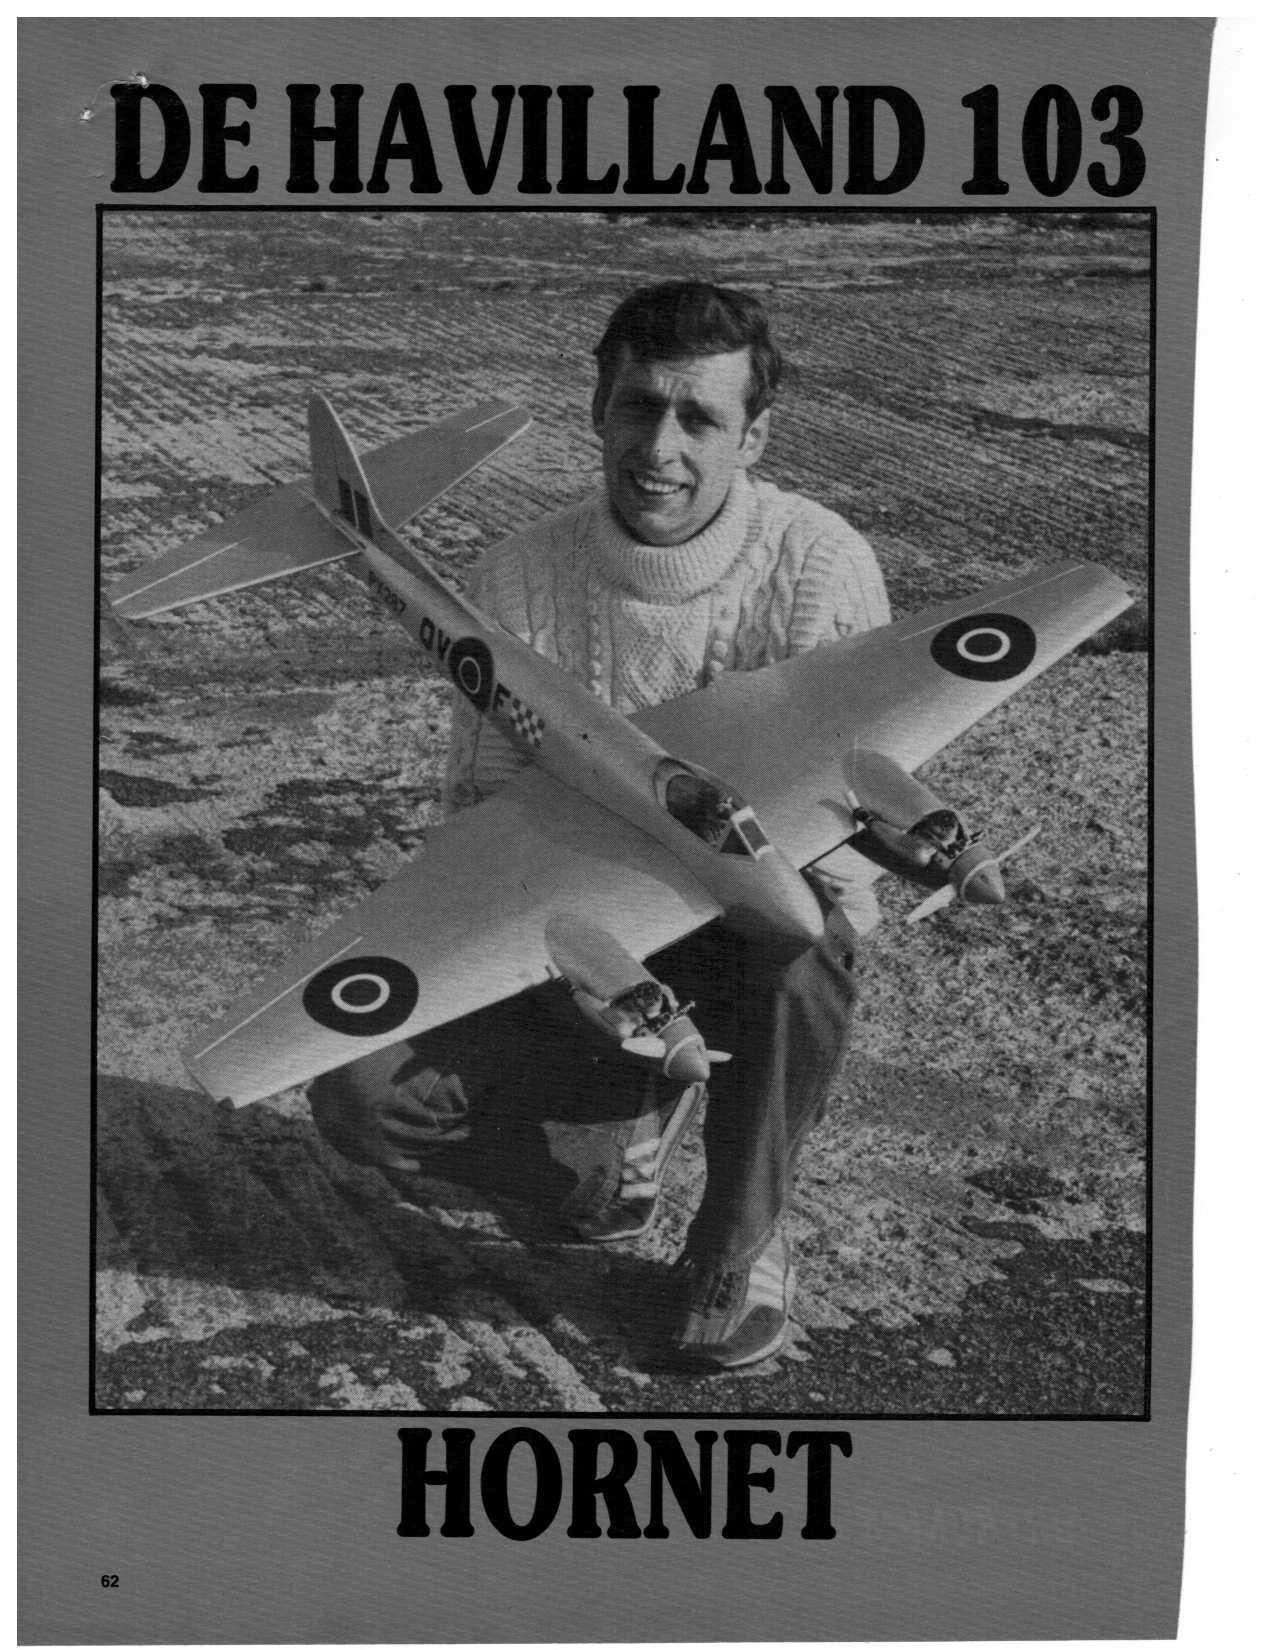 De_Havilland_103_Hornet_RCM-933_oz8001_article.jpg